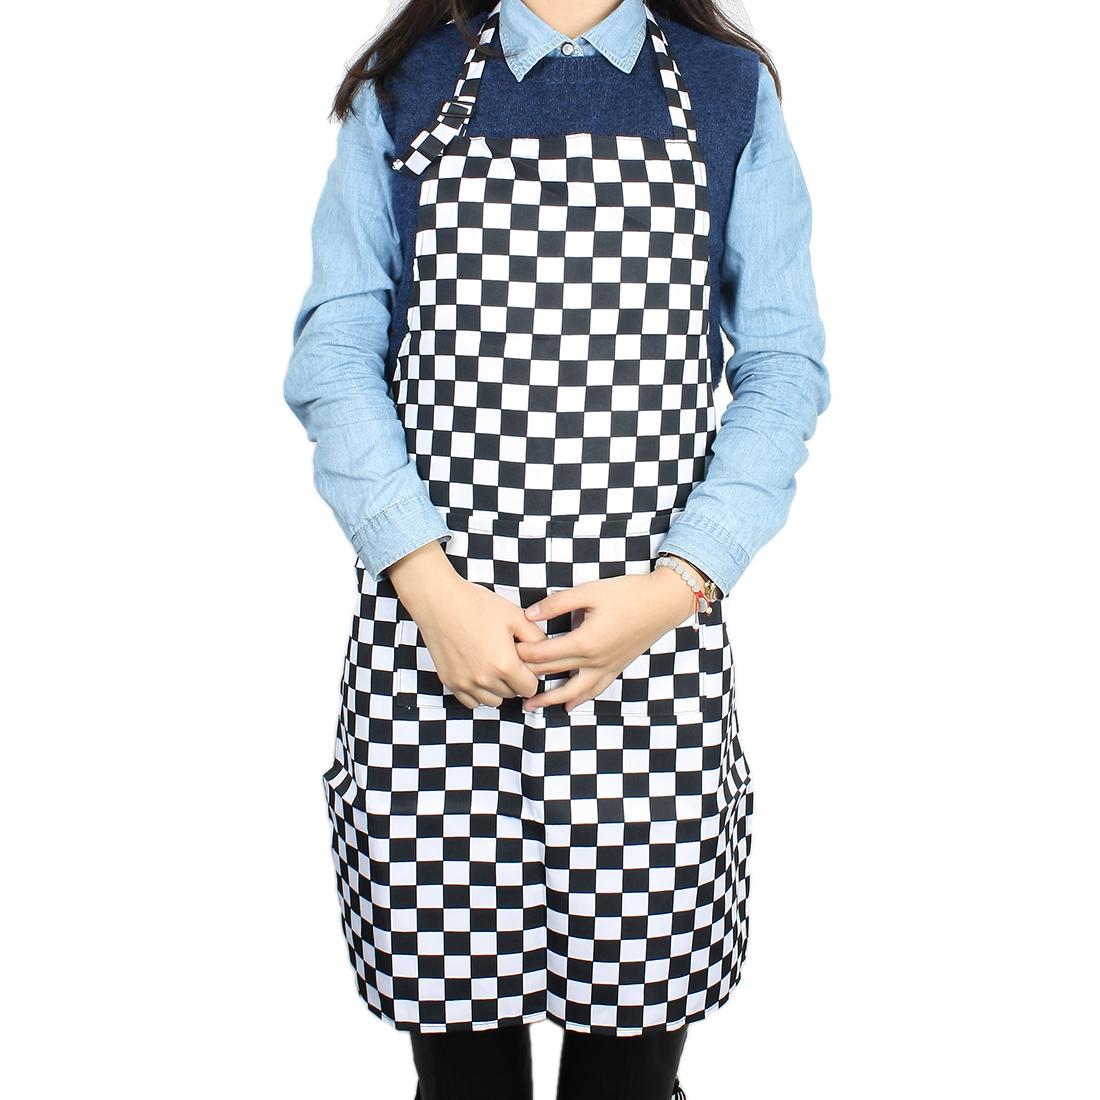 Woman Hot Pot Cooking Fabric Grid Printed Pocket Apron Bib Black White